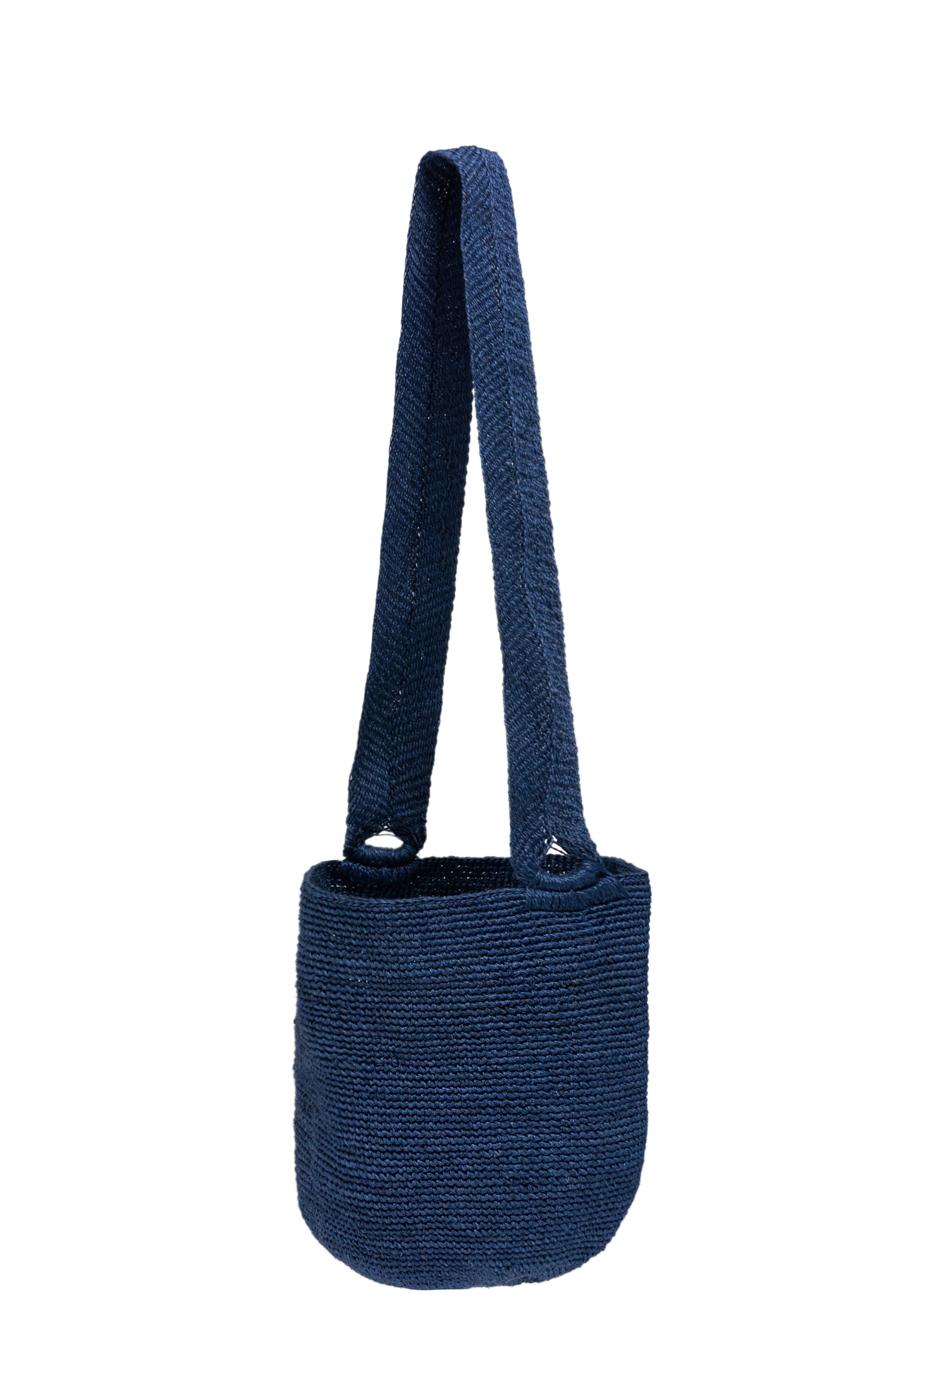 Mochila calceta de plátano-azul navy